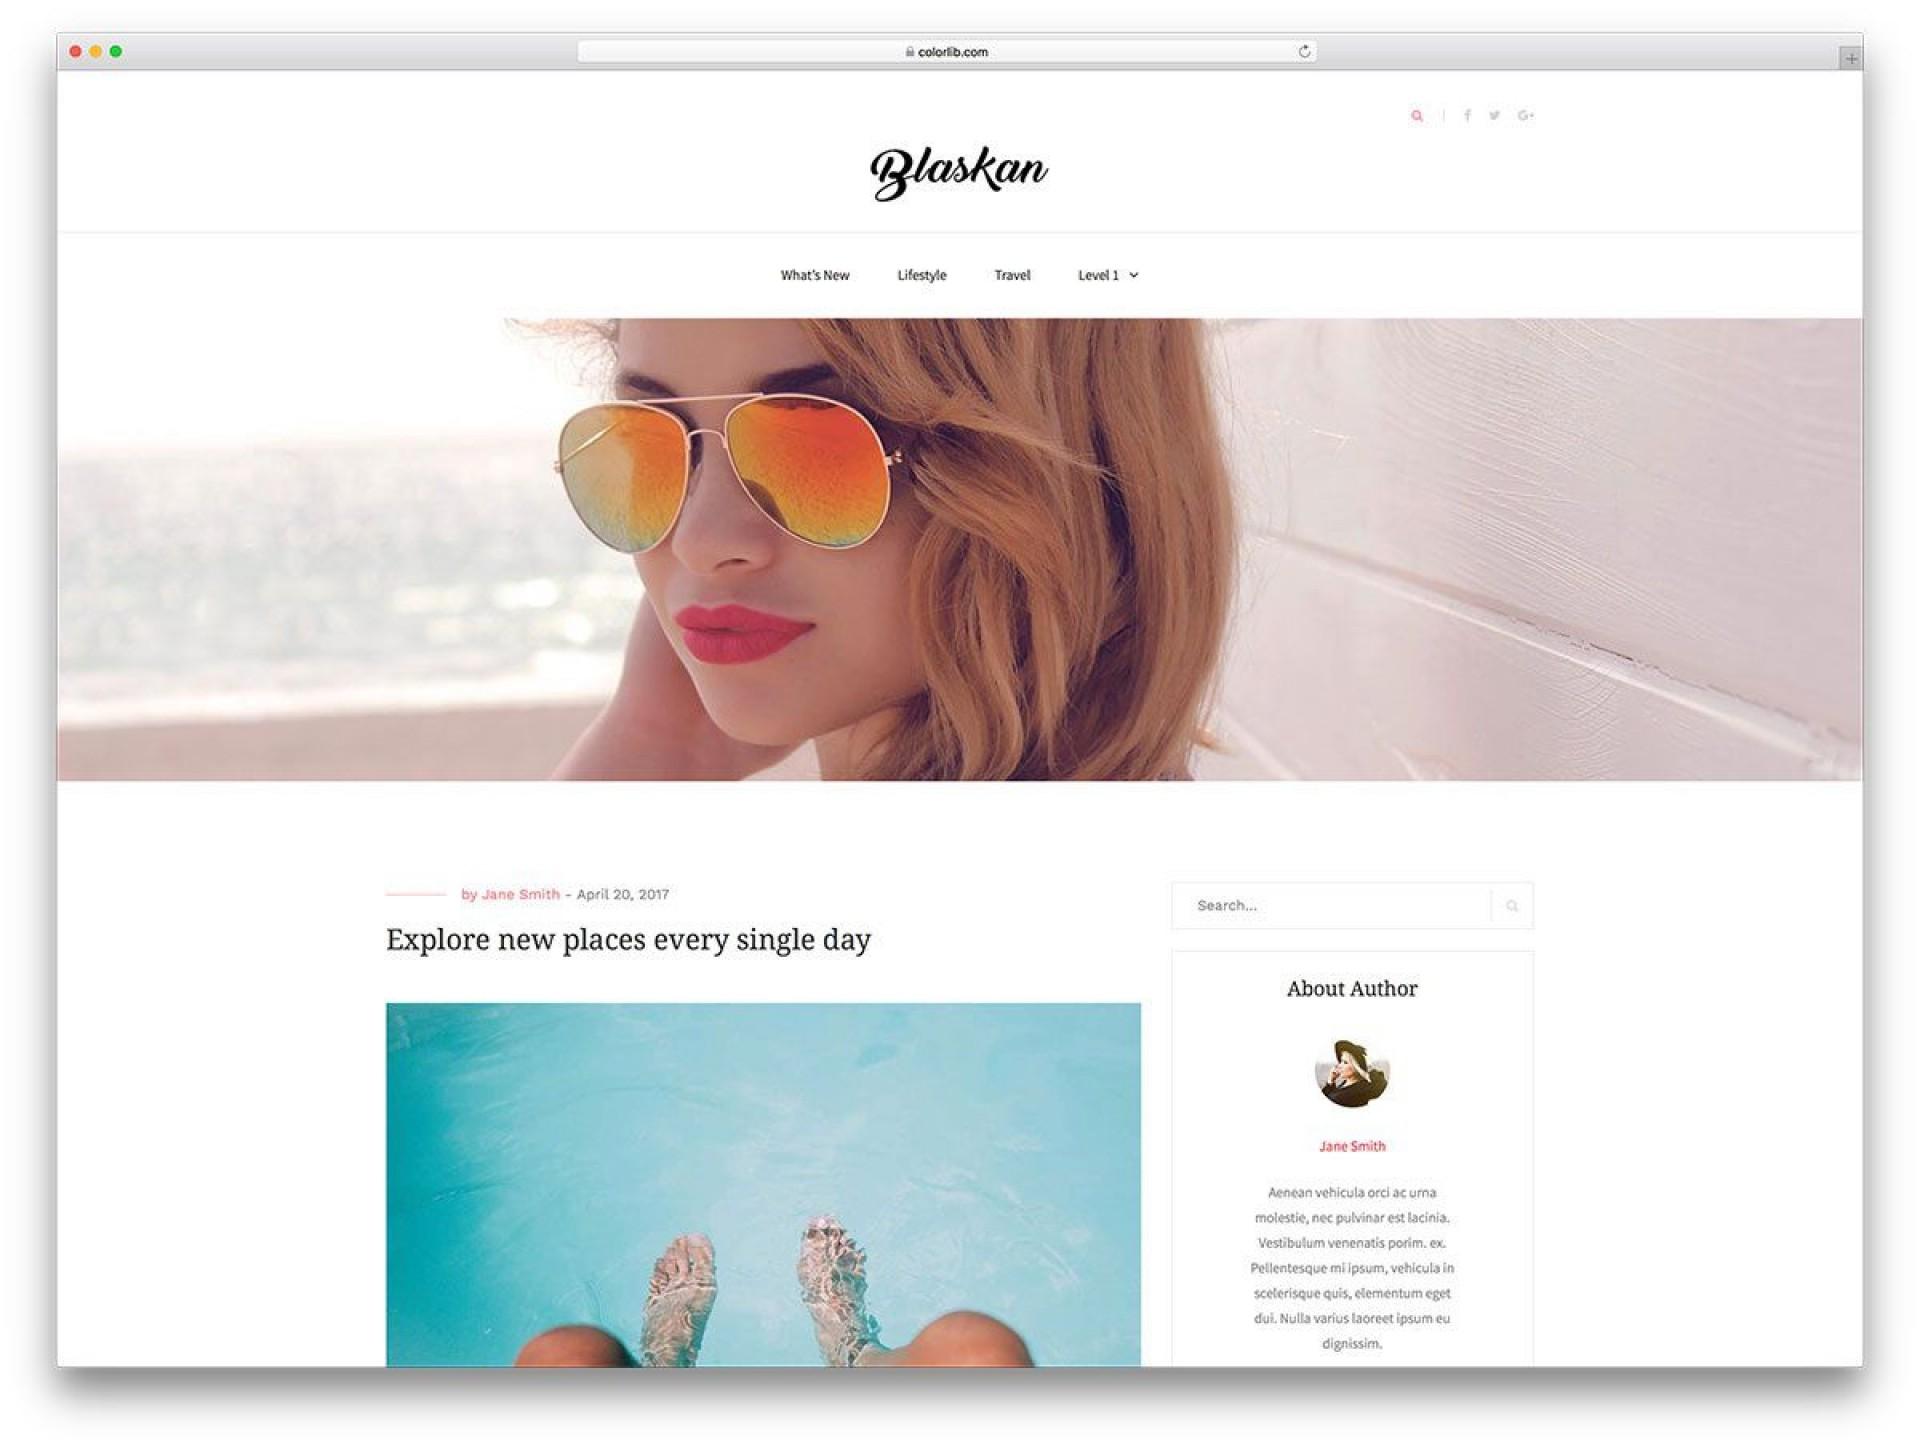 002 Formidable Free Blog Template Wordpres High Def  Wordpress Best Travel Theme Food 20201920